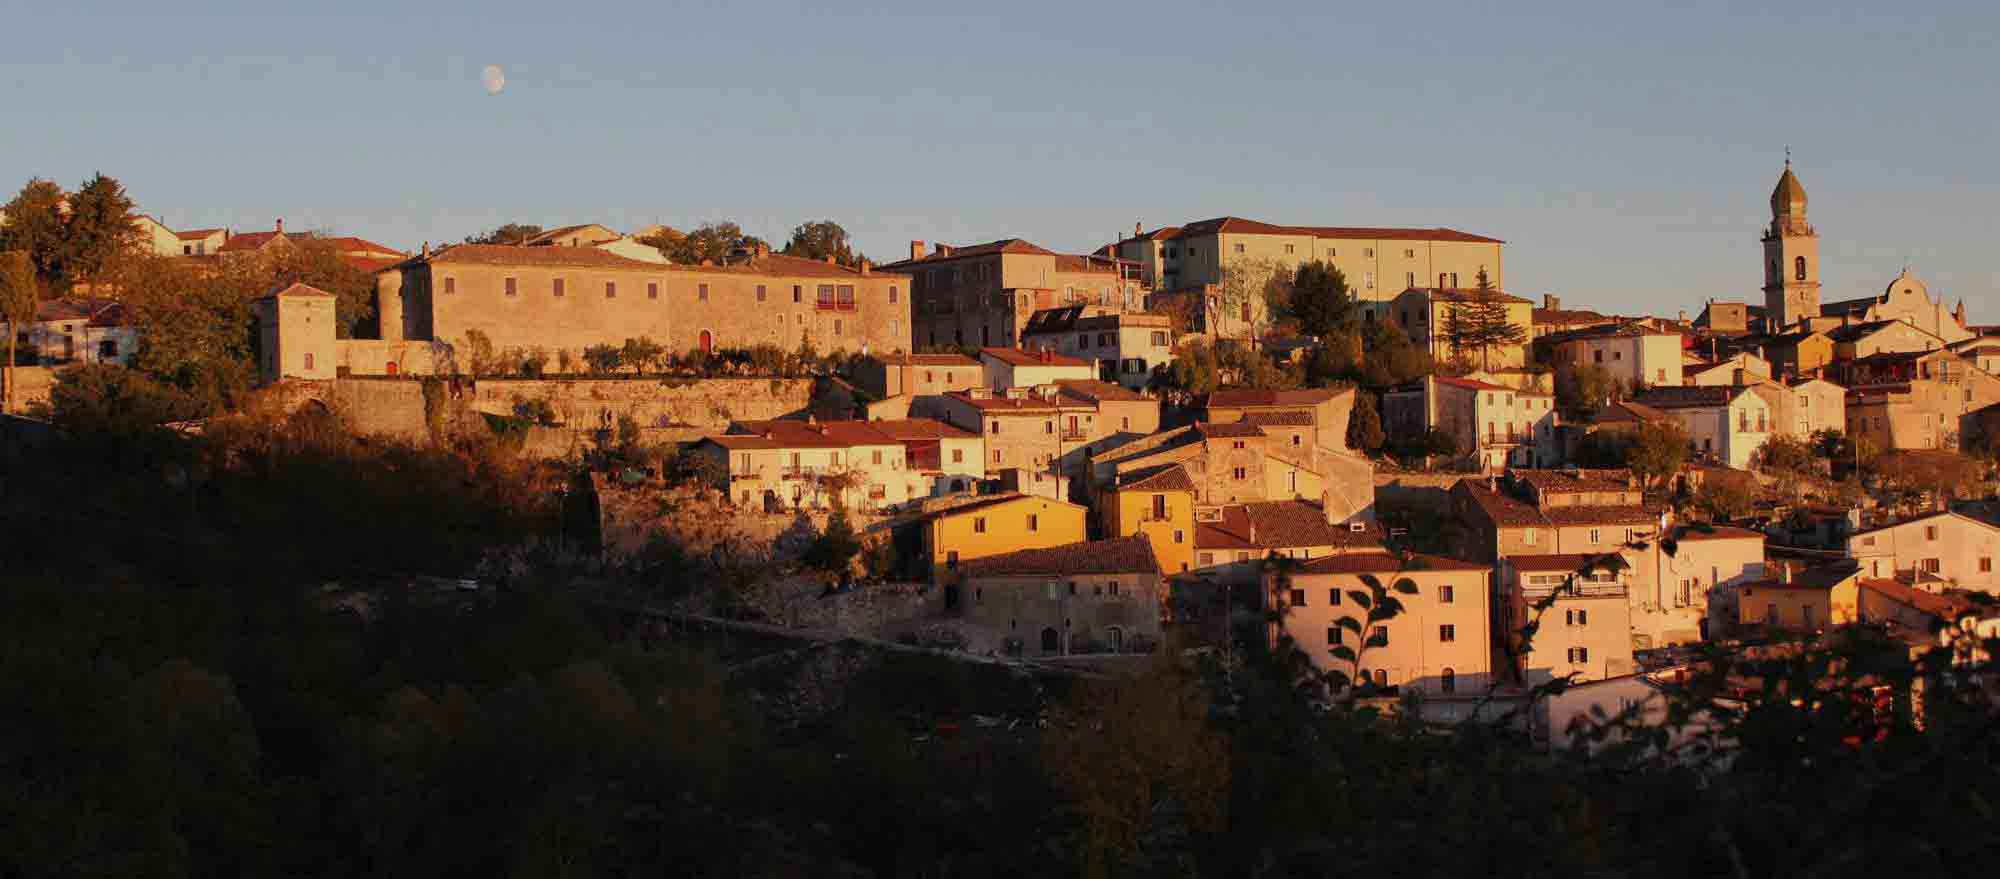 Santa_croce_del_sannio_al_tramonto